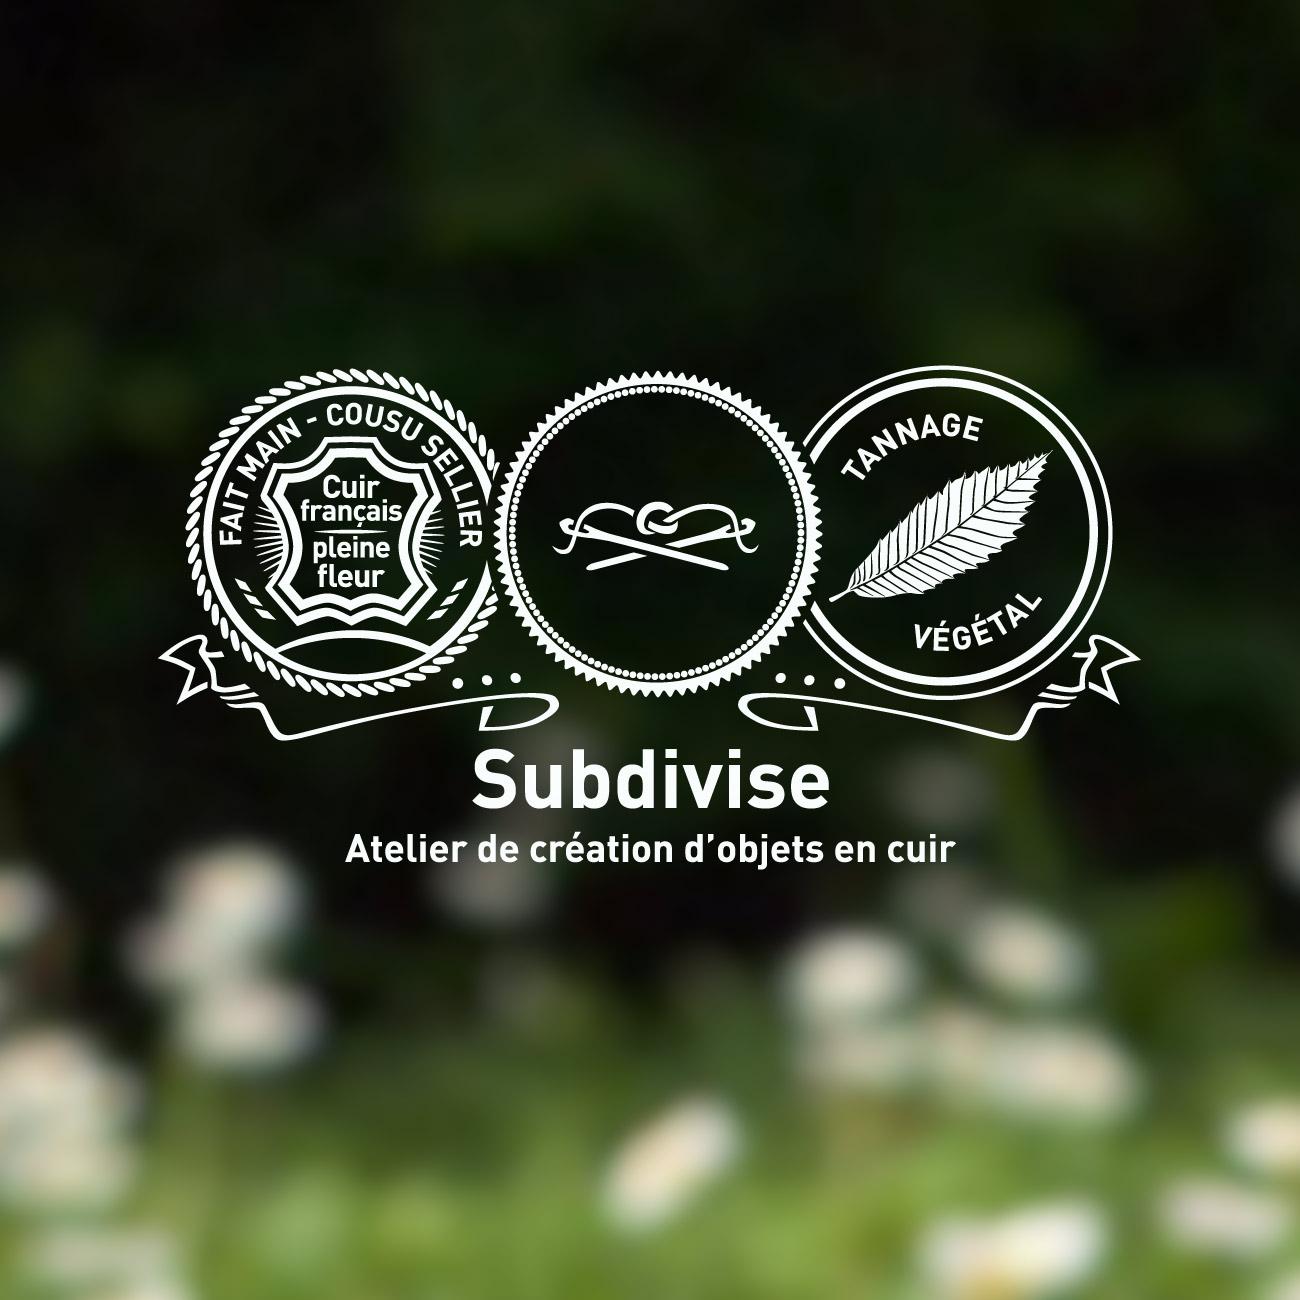 atelier_subdivise_img16_HD